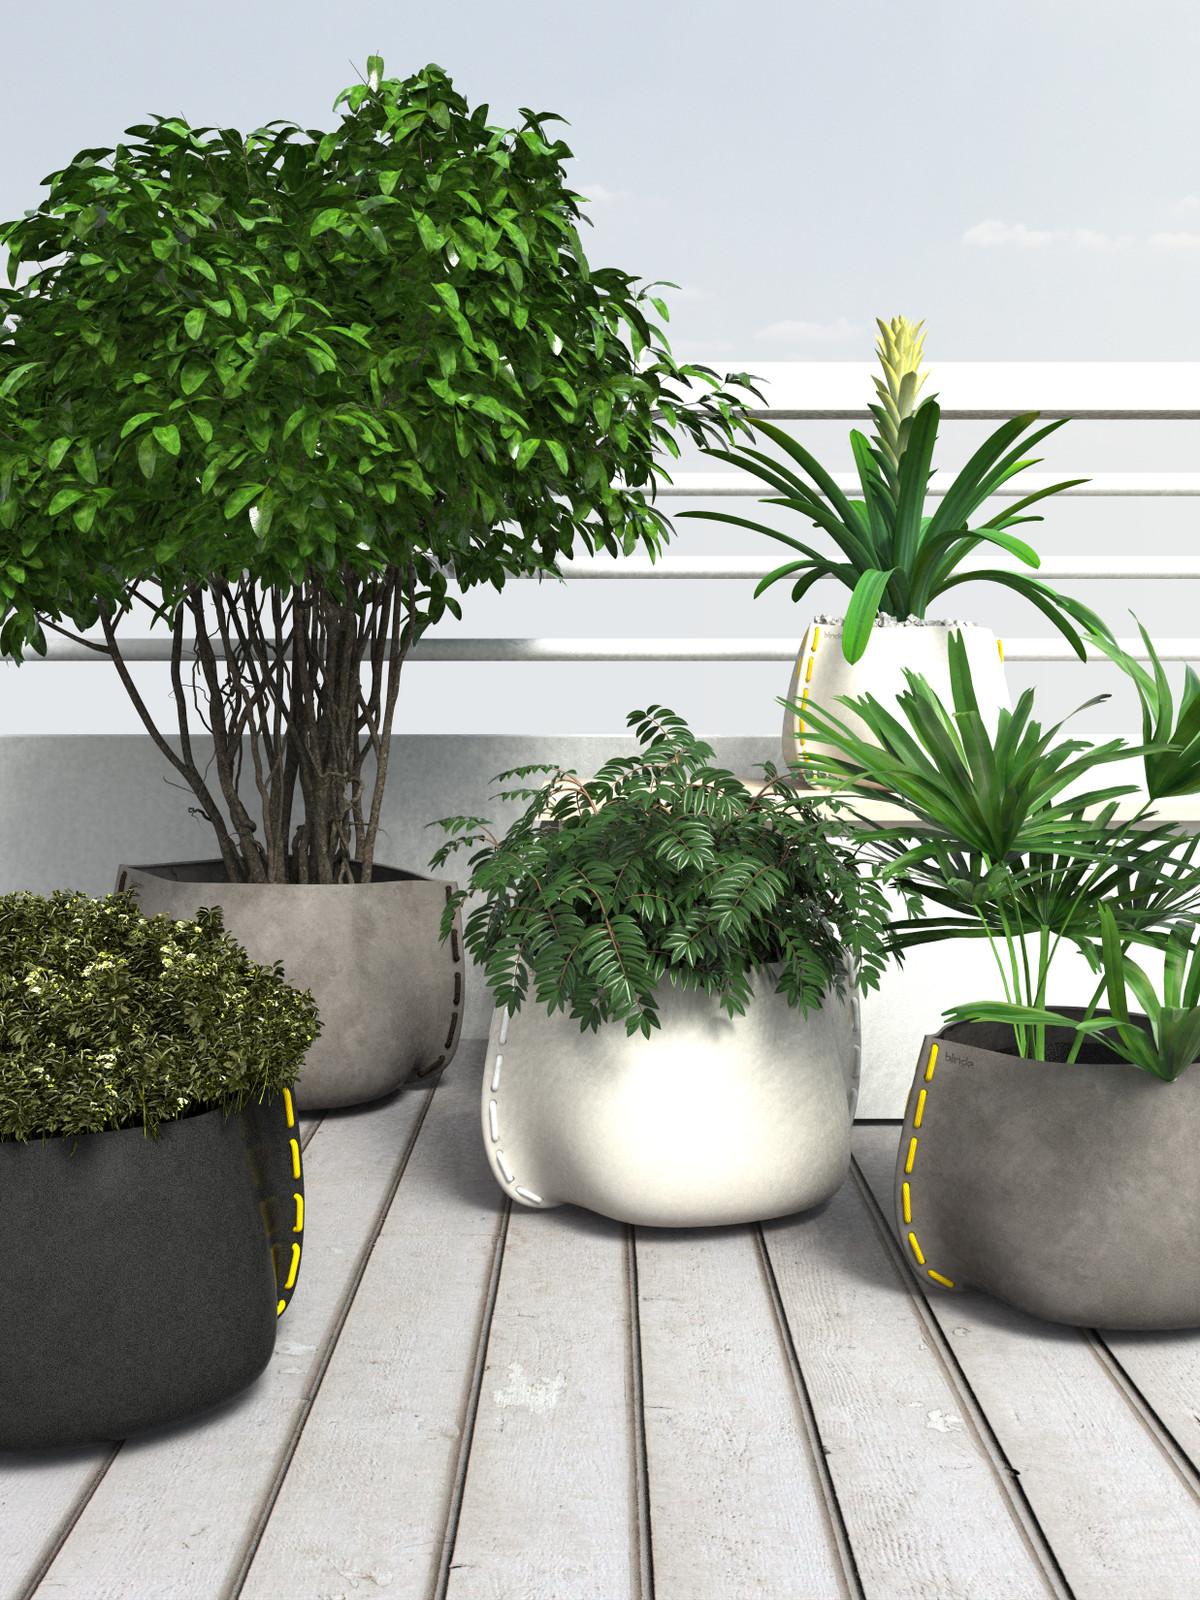 Stitch 125 - Plant Pot